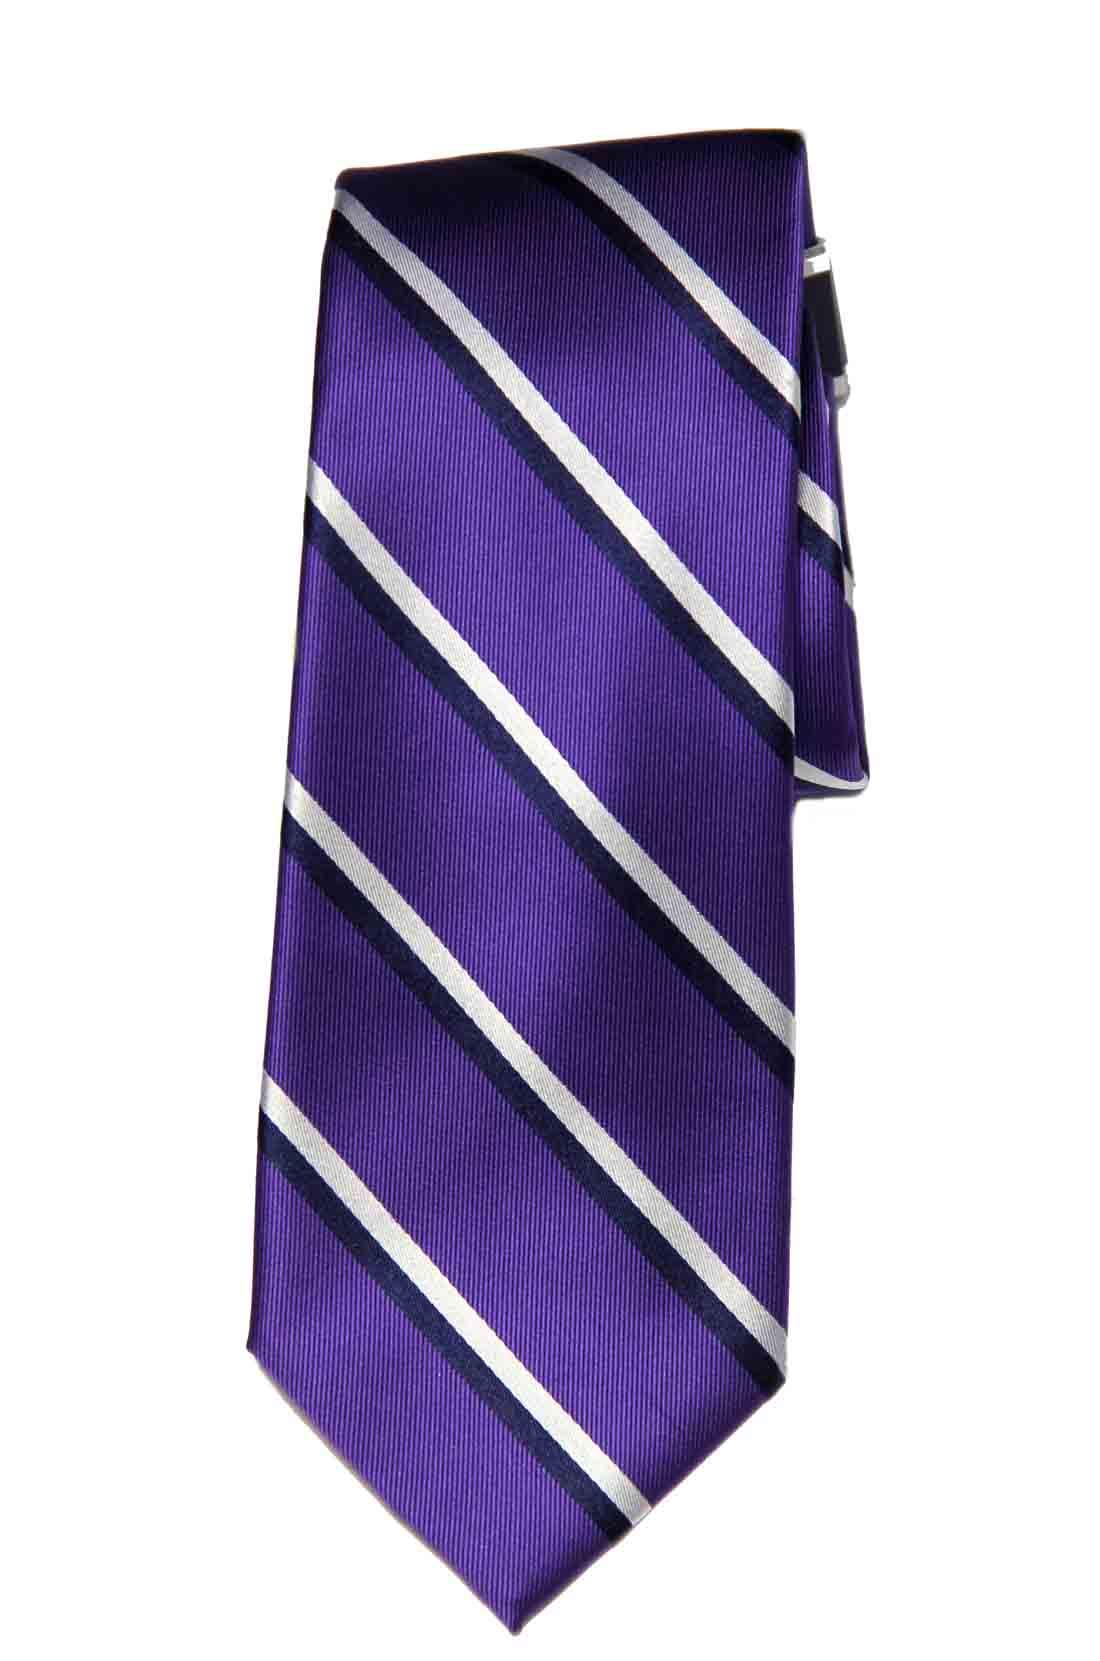 Club Room Beacon Hill Stripe Tie Purple Black White Men's